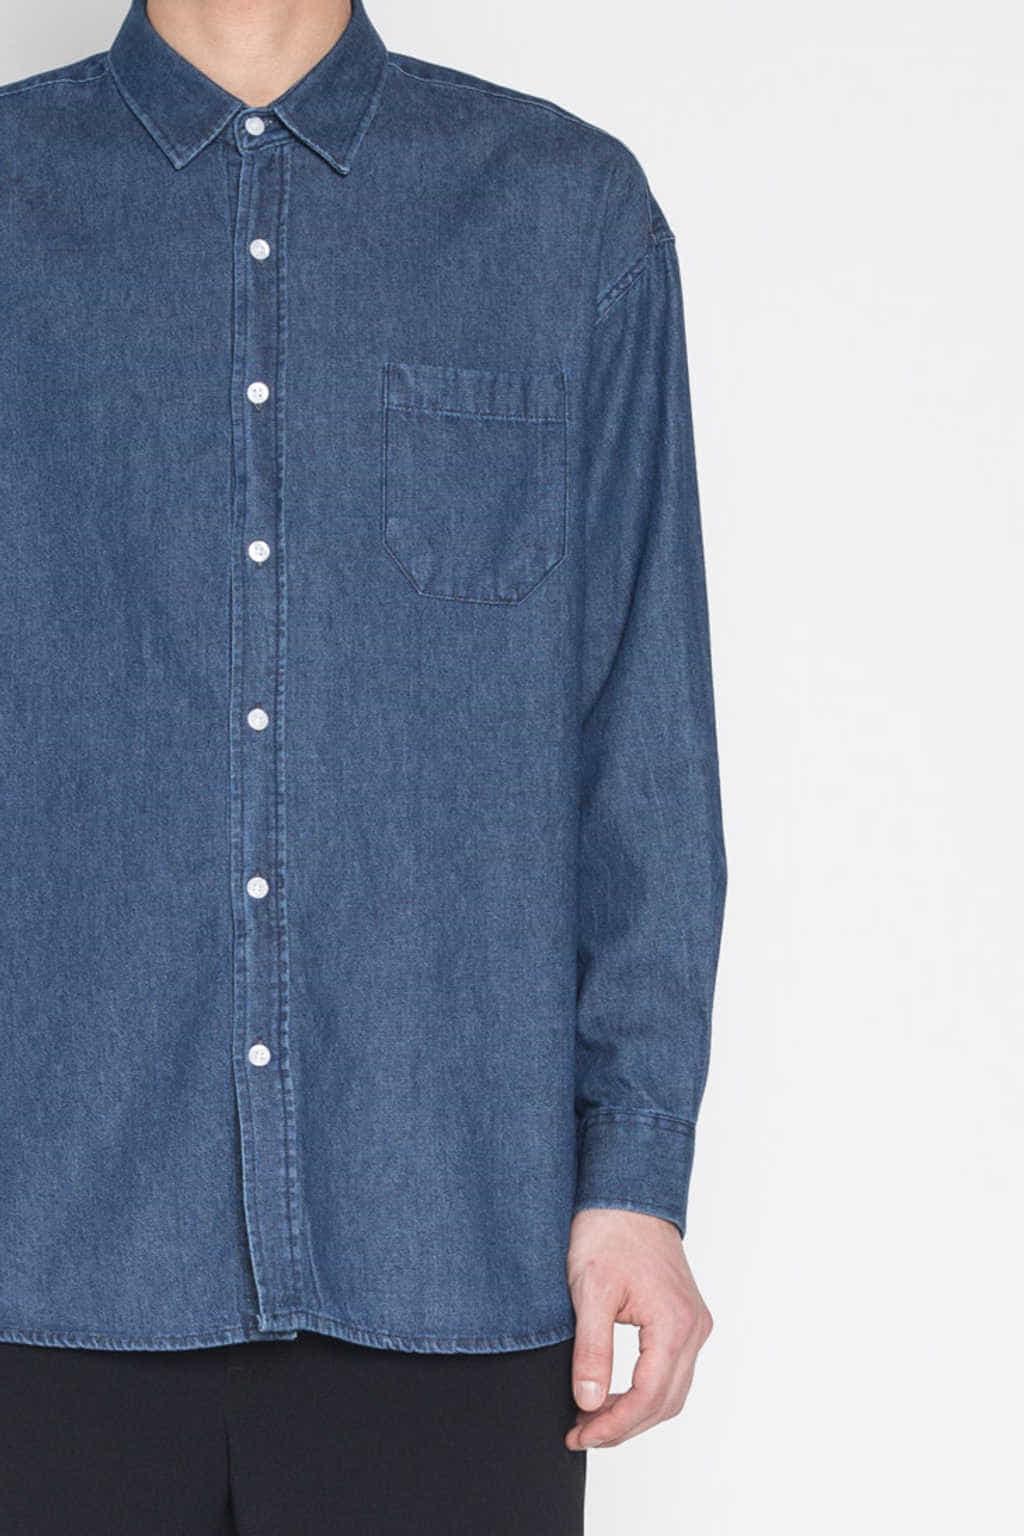 Shirt G006 Indigo 2